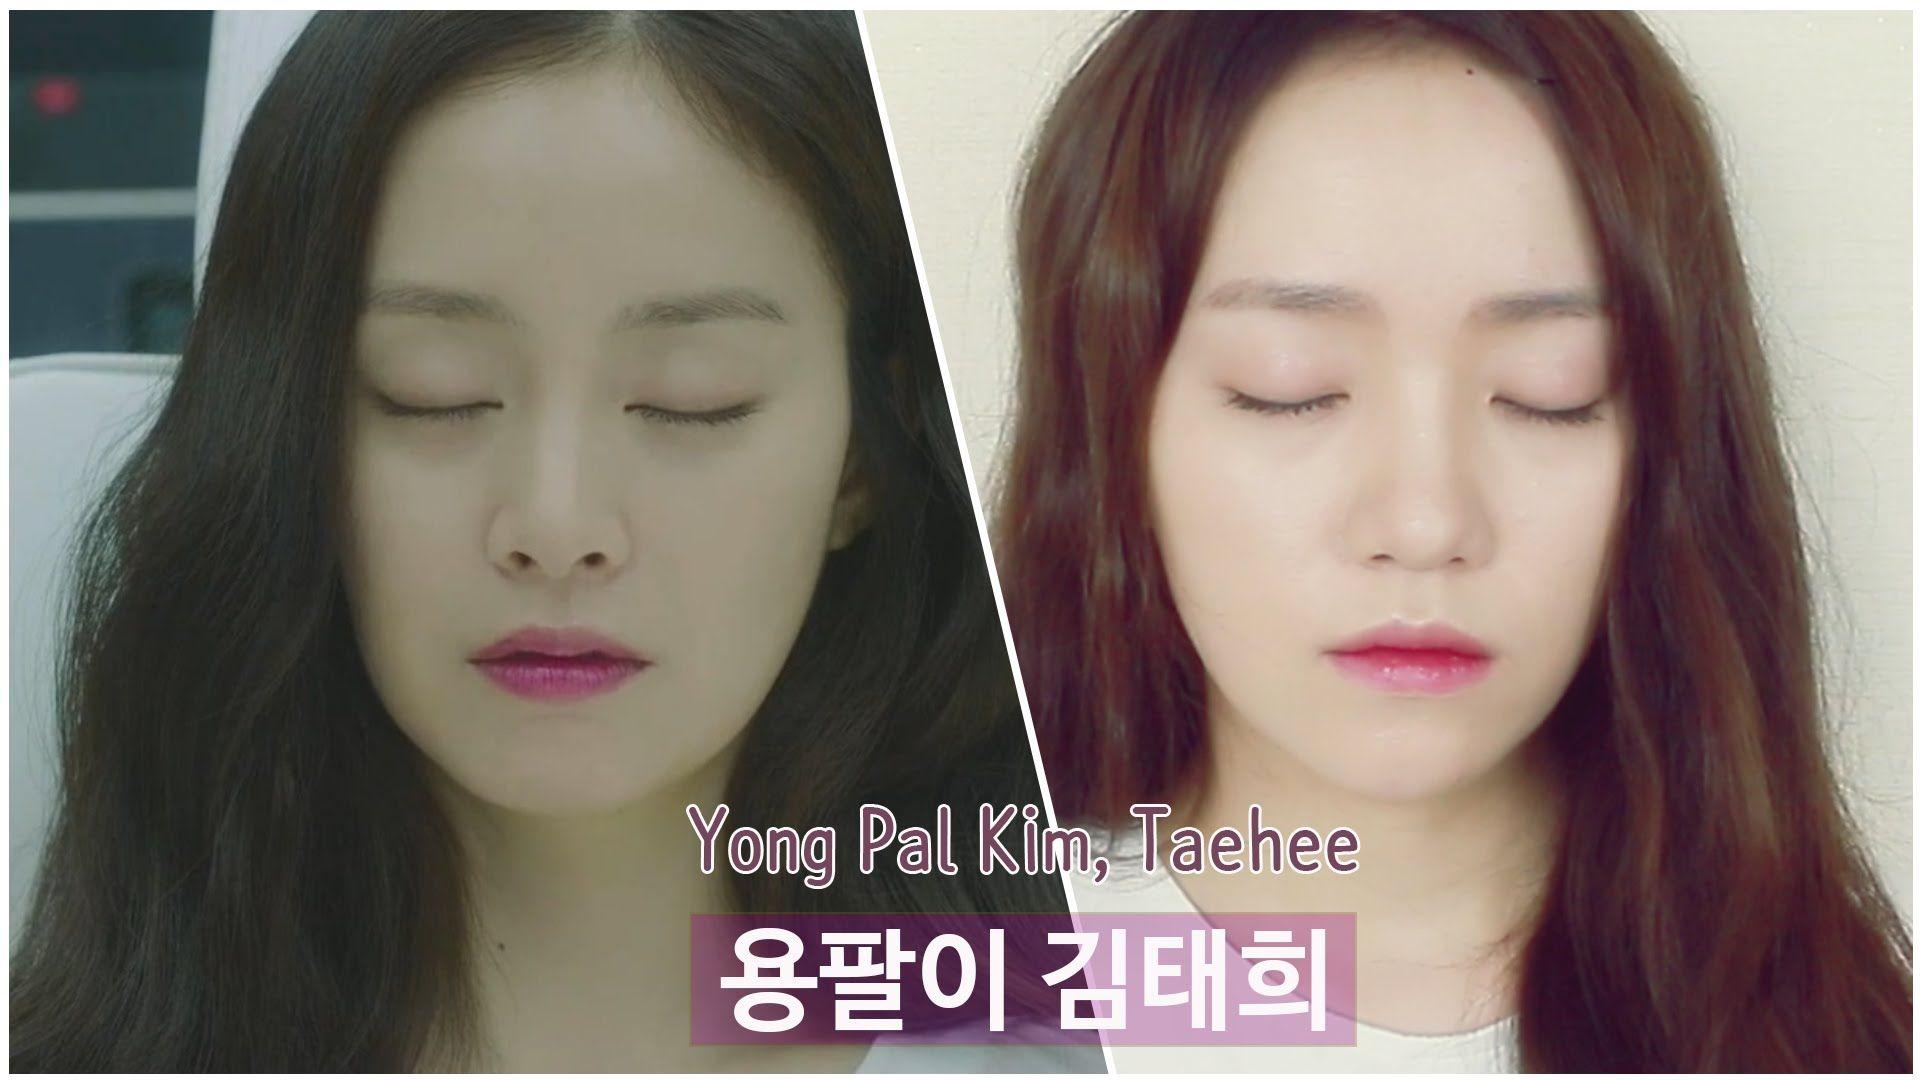 [ENG] 용팔이 김태희 메이크업 튜토리얼 / Yong Pal Kim Taehee makeup | 헬로우토끼 HelloRabbit